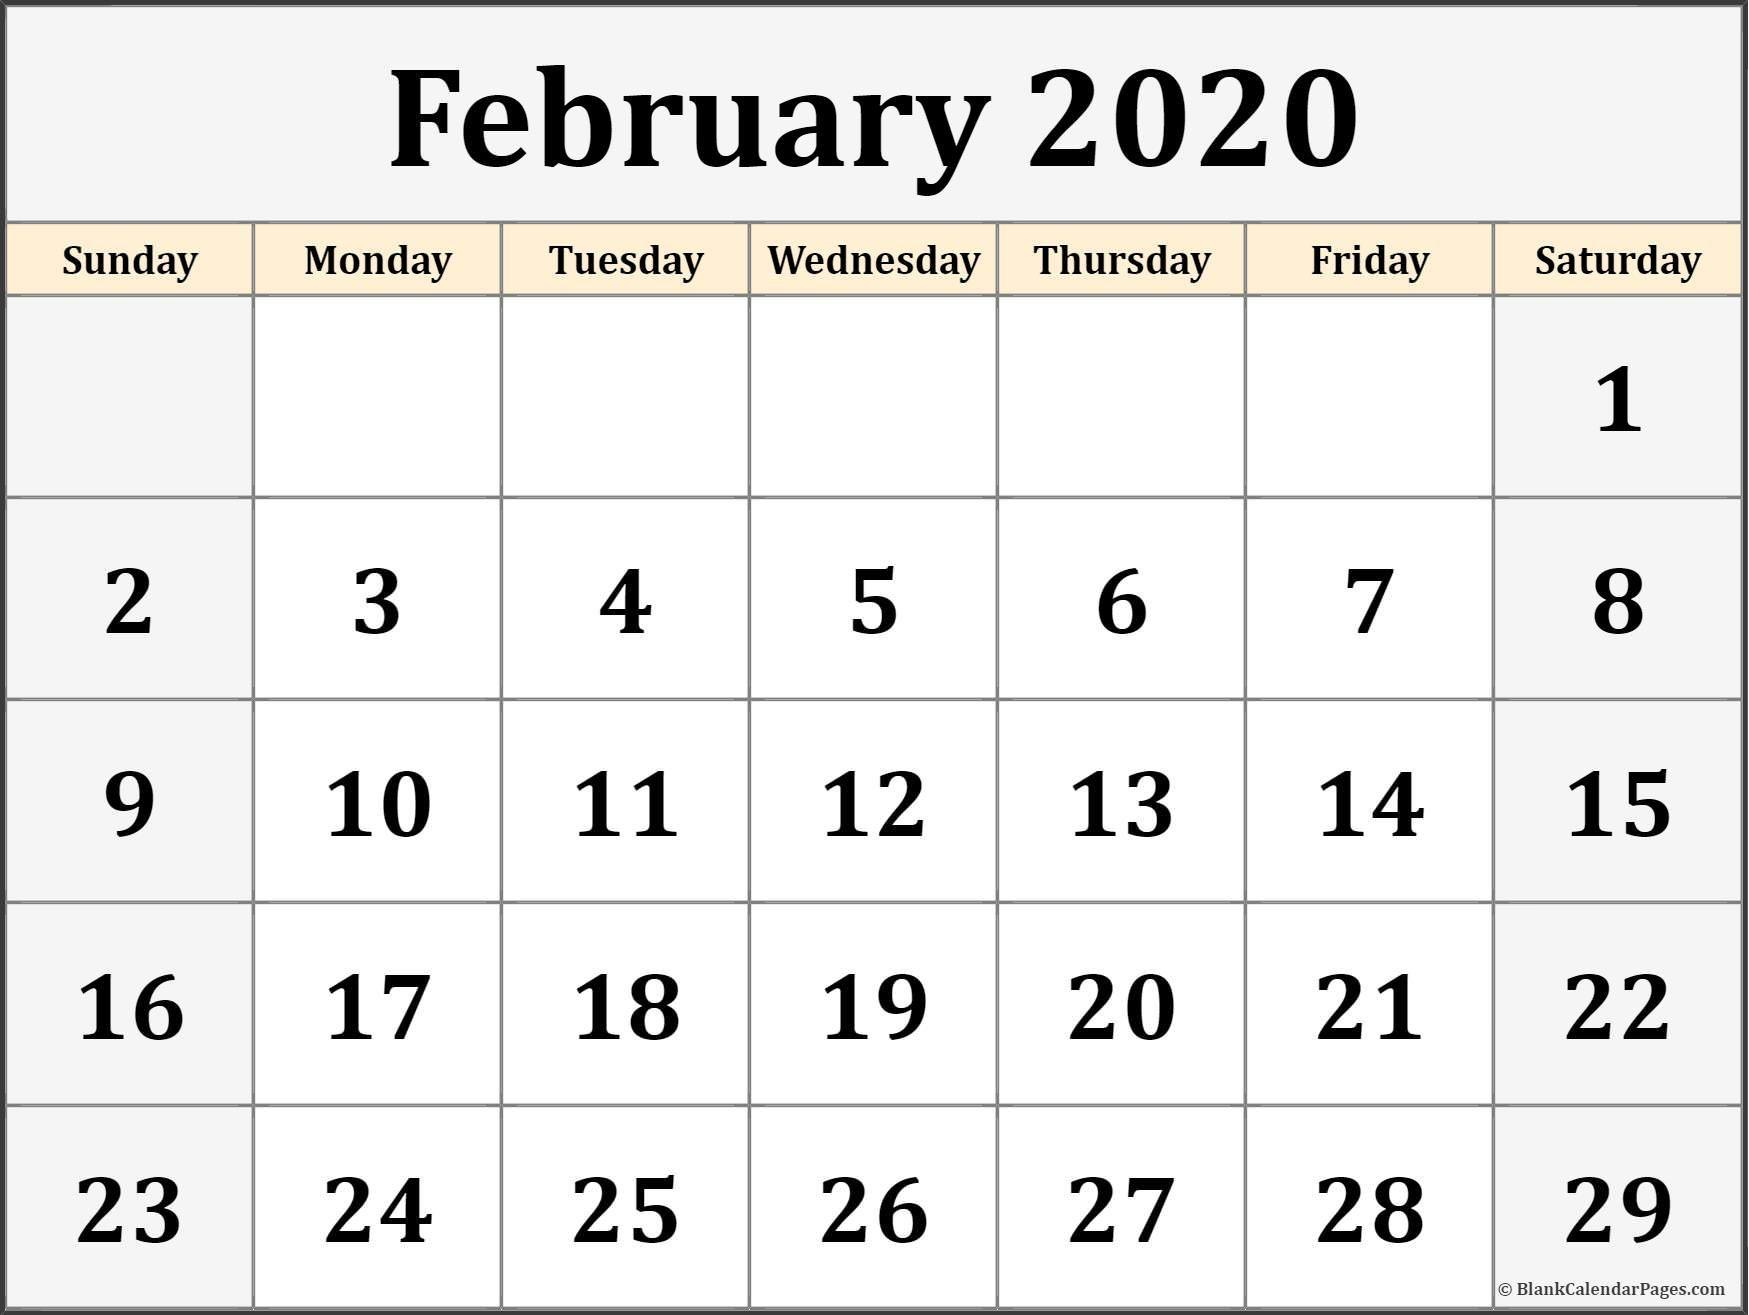 February Calendar 2019 Template #february #februarycalendar